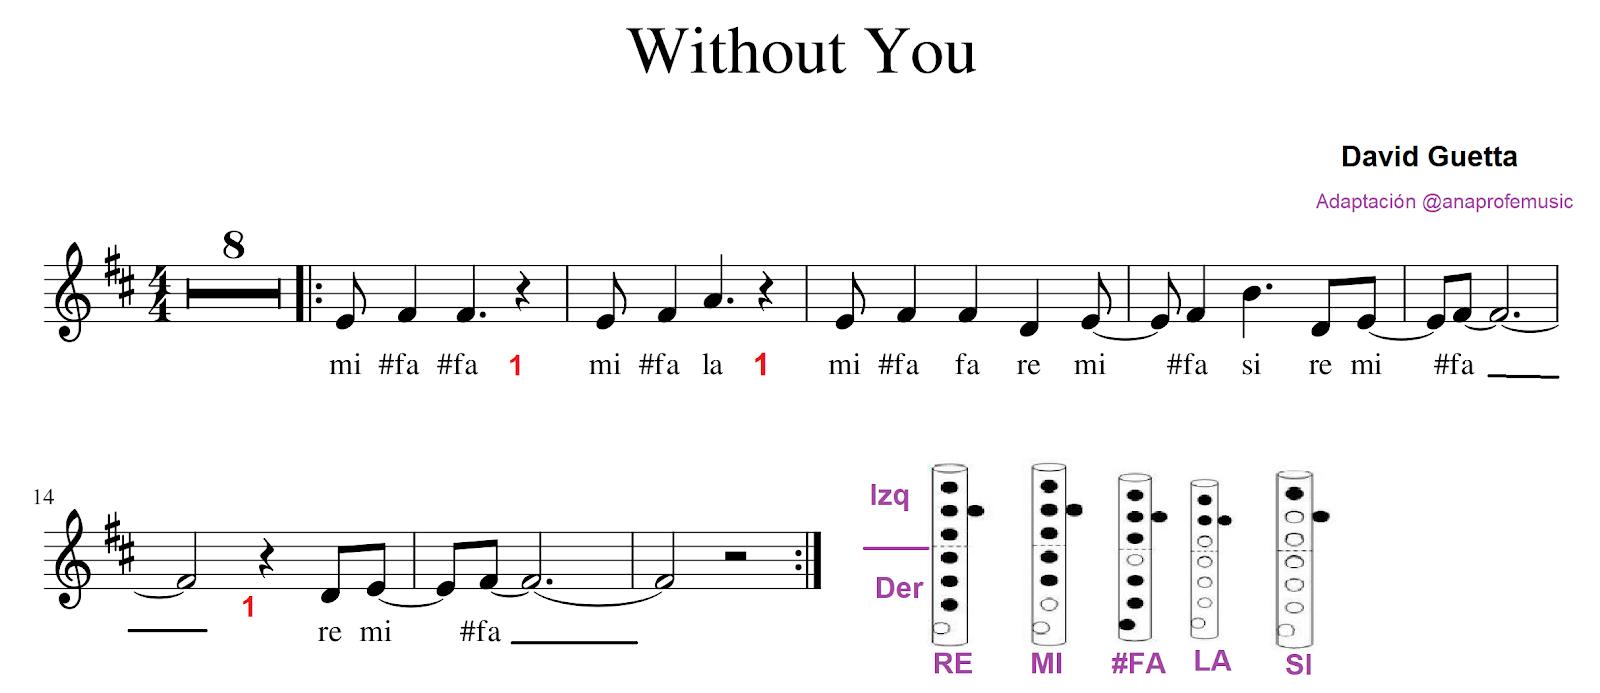 partitura without yout david guetta flauta